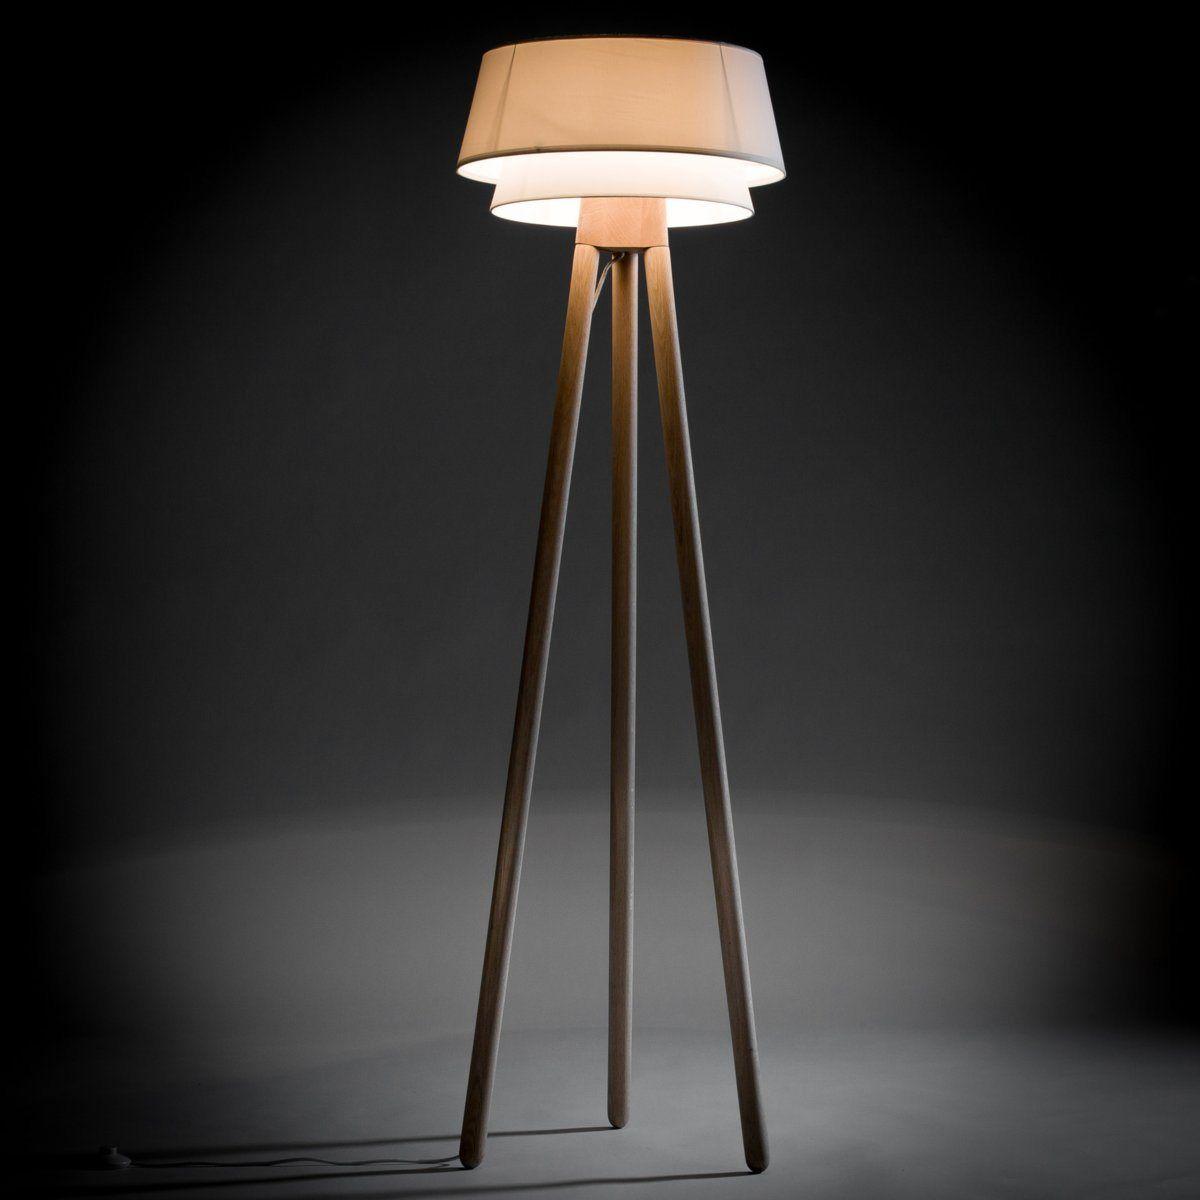 Pied De Lampe Am Pm pied de lampadaire, epilogon   tripod lamp, floor lamp, lighting